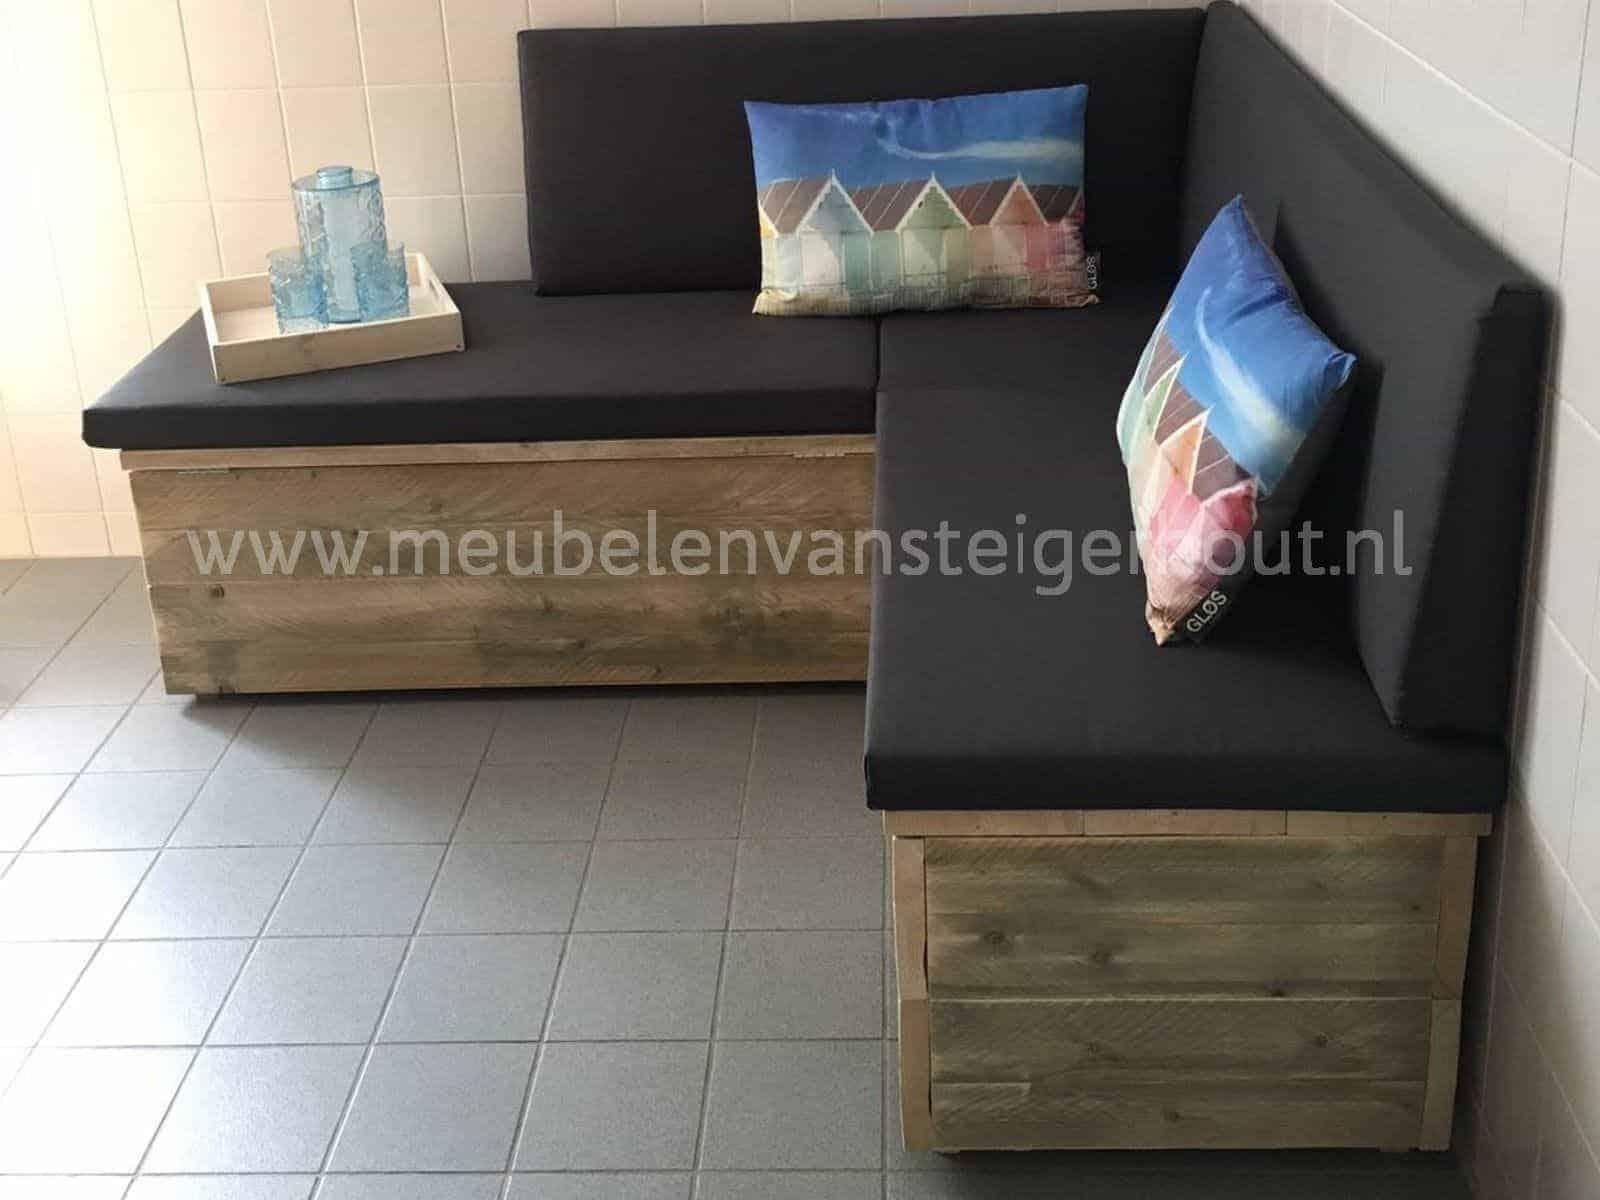 Steigerhout Meubel Kussens.Kist Steigerhout Met Kussens Het Gooi1 Meubelen Van Steigerhout